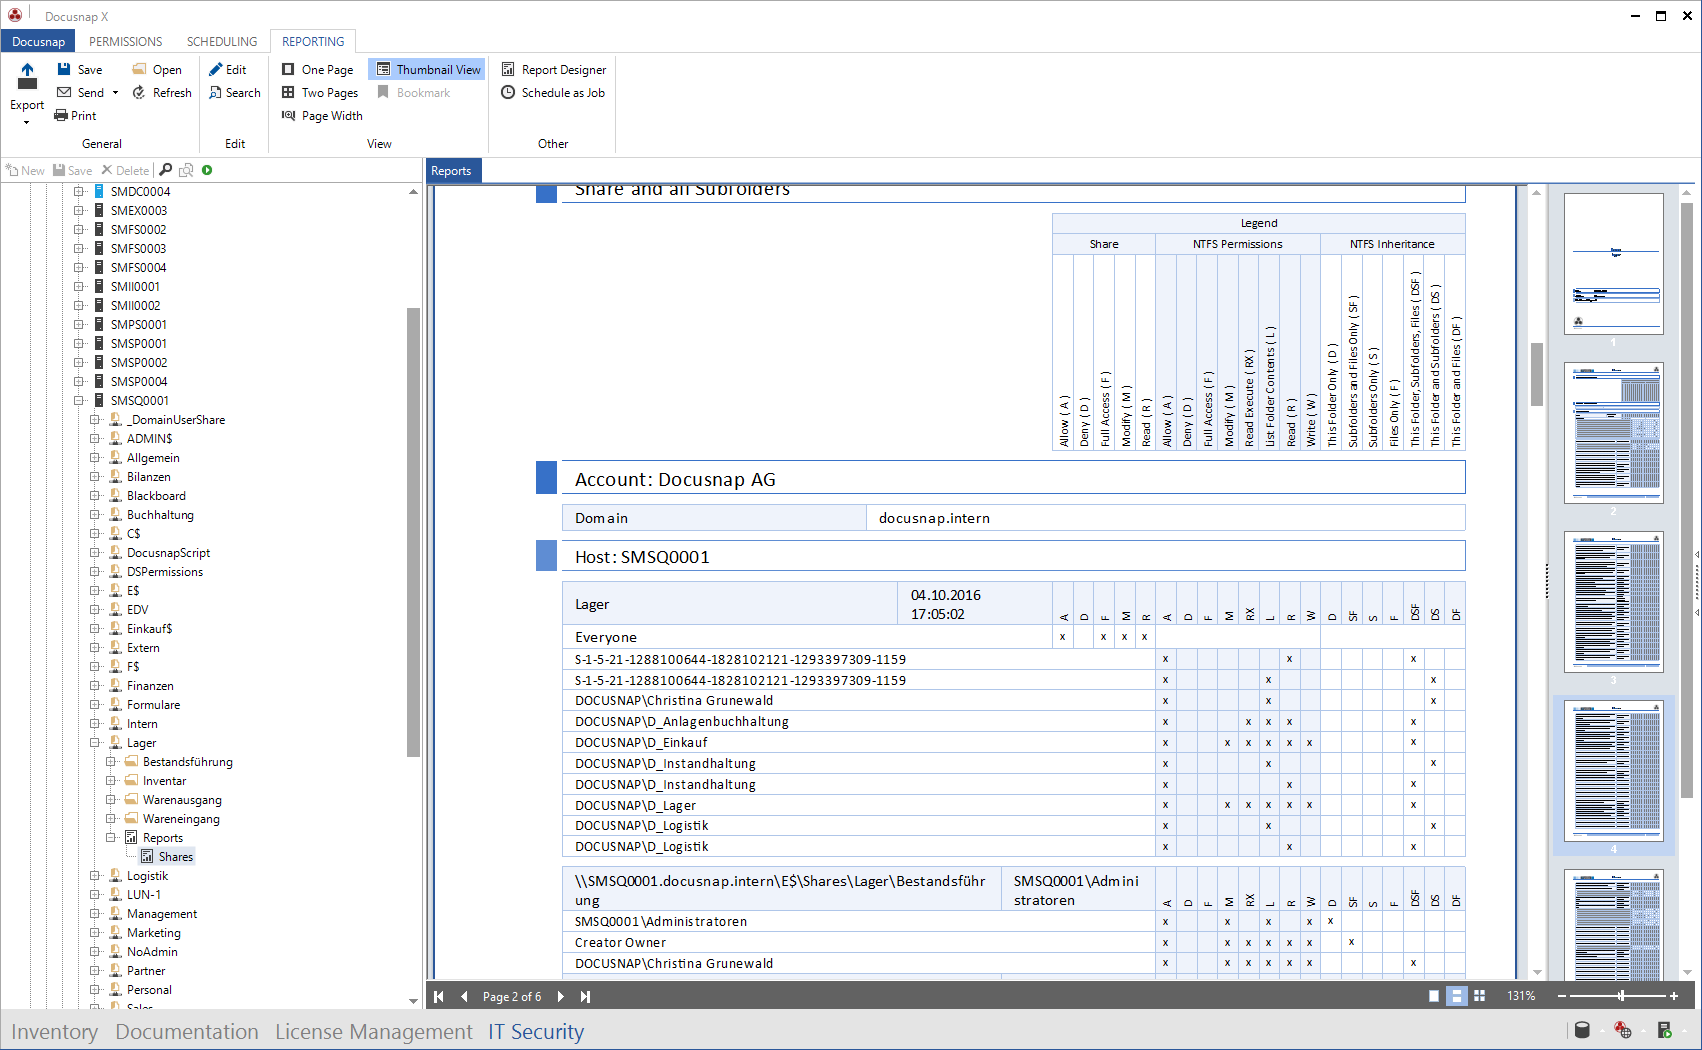 Screenshot: Permission Analysis Report